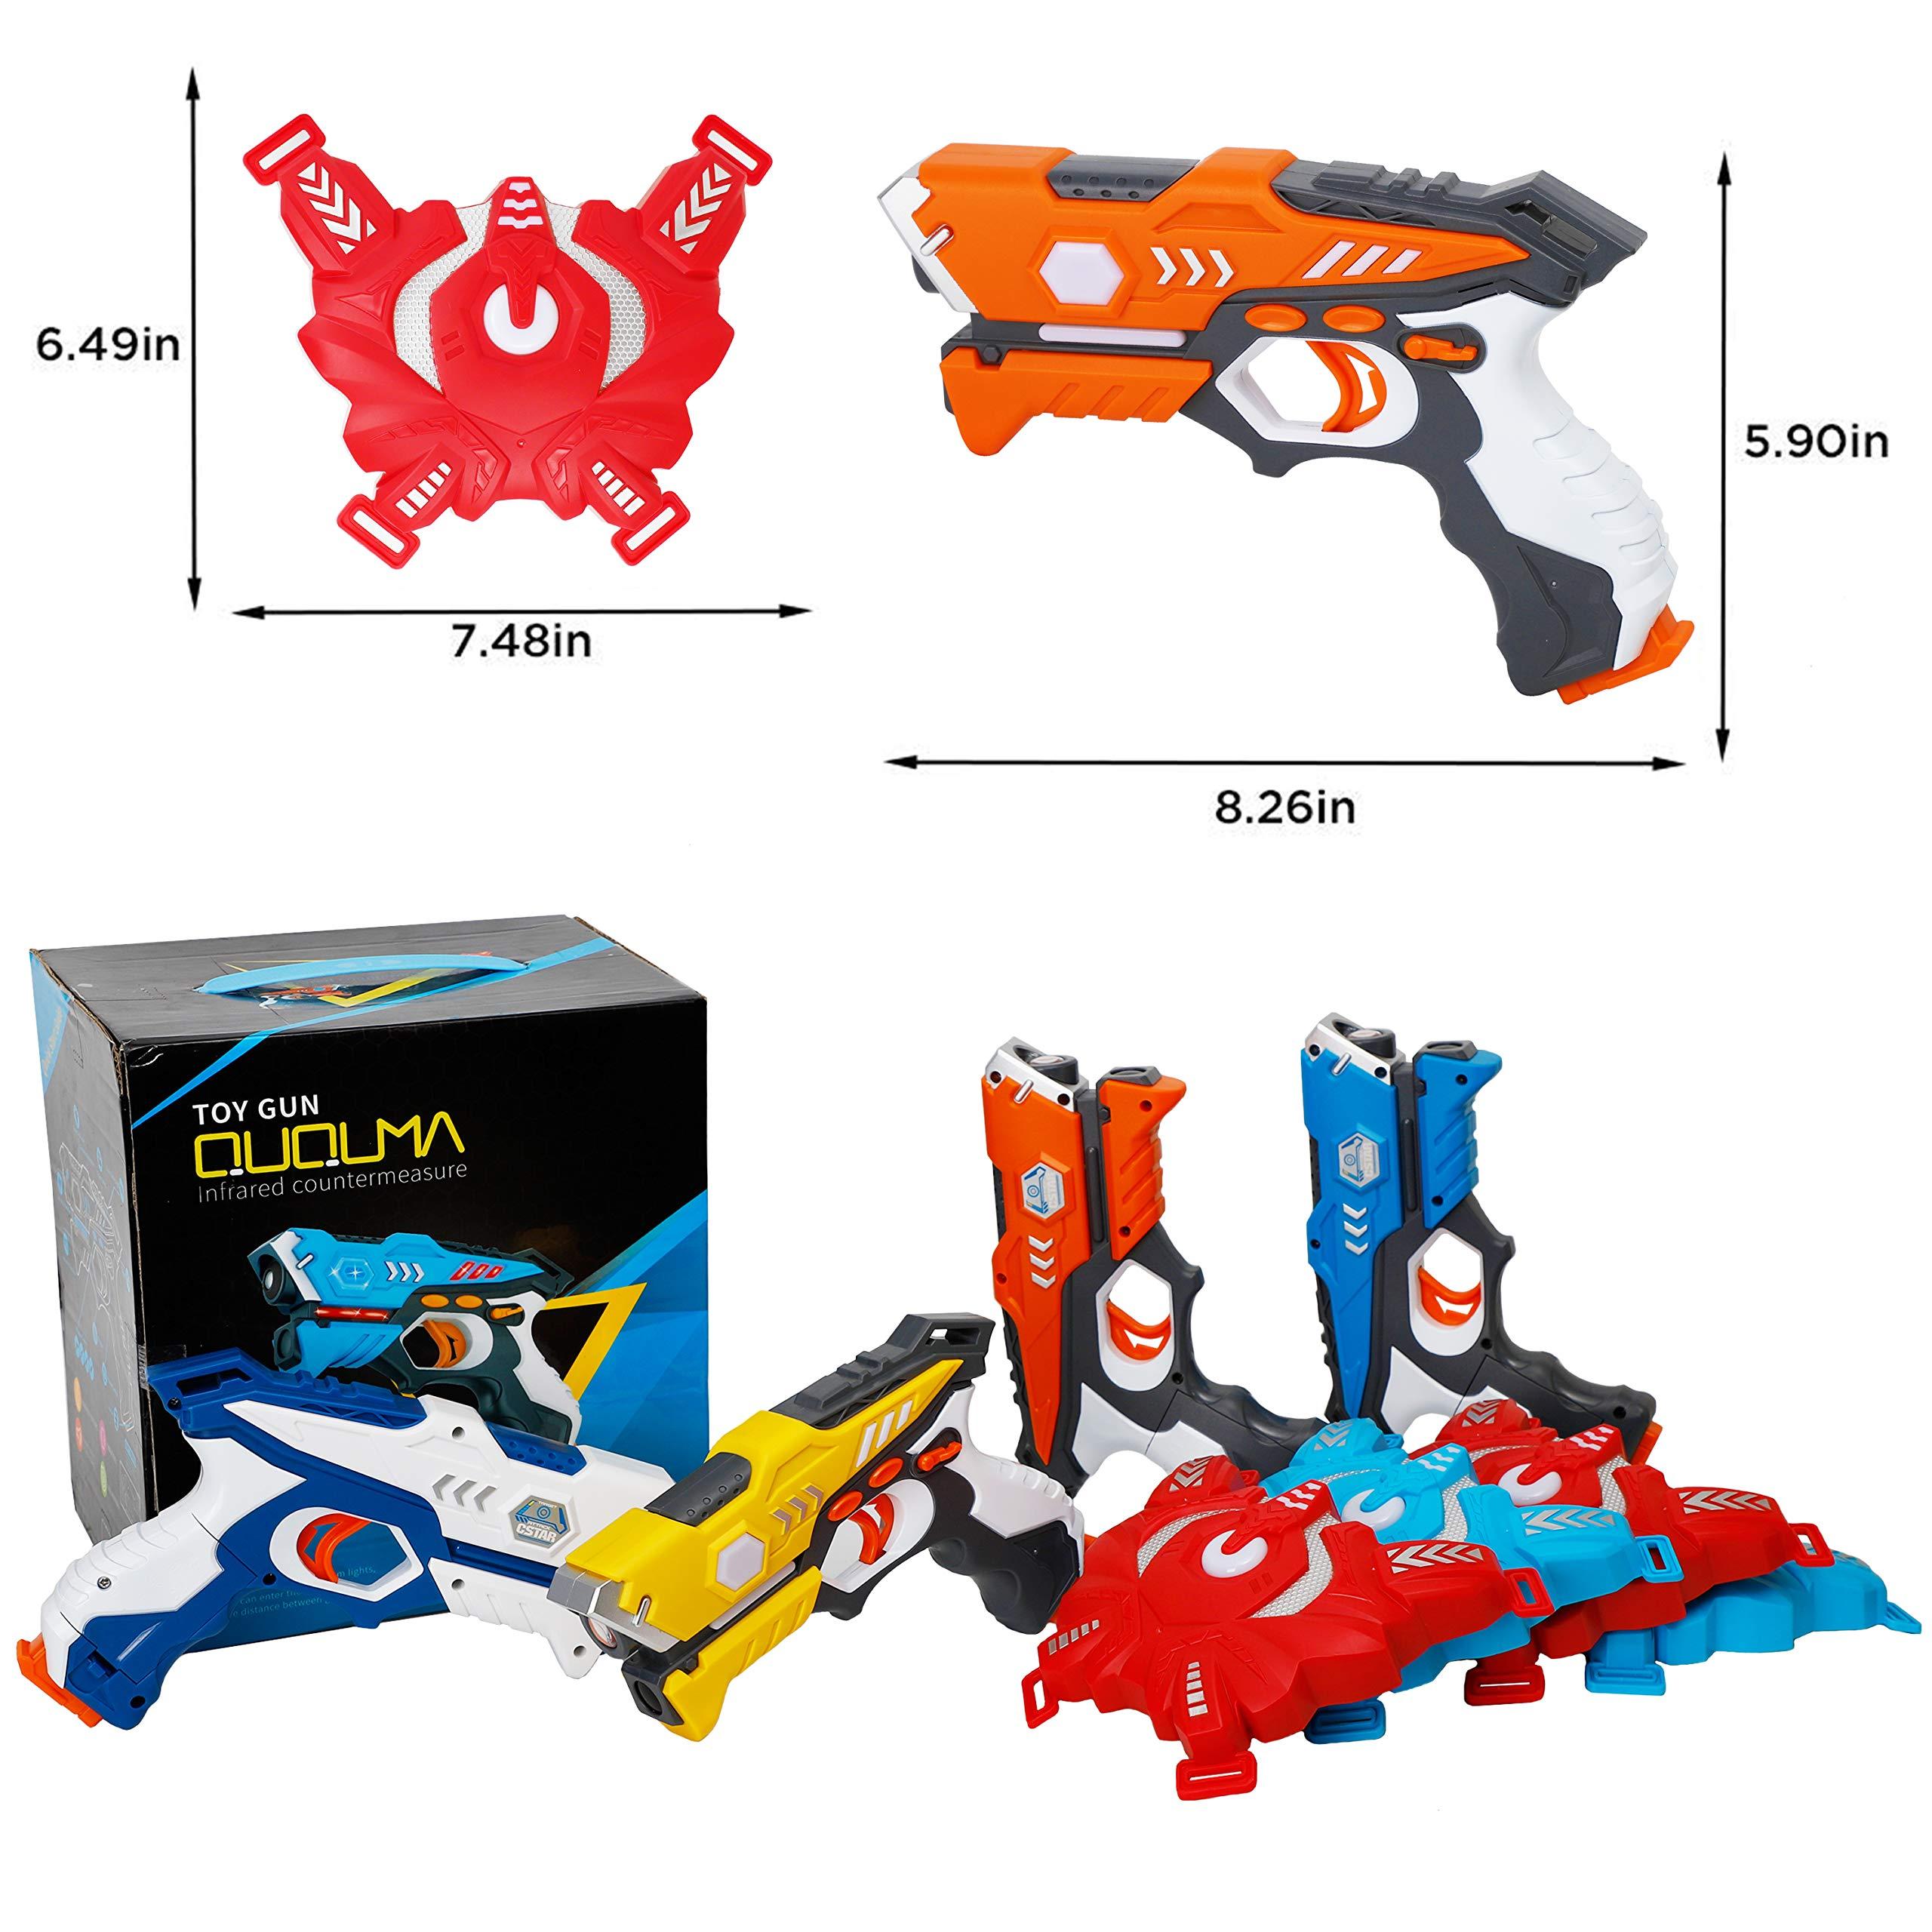 QUQUMA Infrared Laser Tag Set 4 Guns 4 Vests - Indoor Outdoor Laser Gun Kit Toy for Girl & Boy Laser Tag Game Set Best Gift Boys Girls(Laser Guns) by QUQUMA (Image #8)